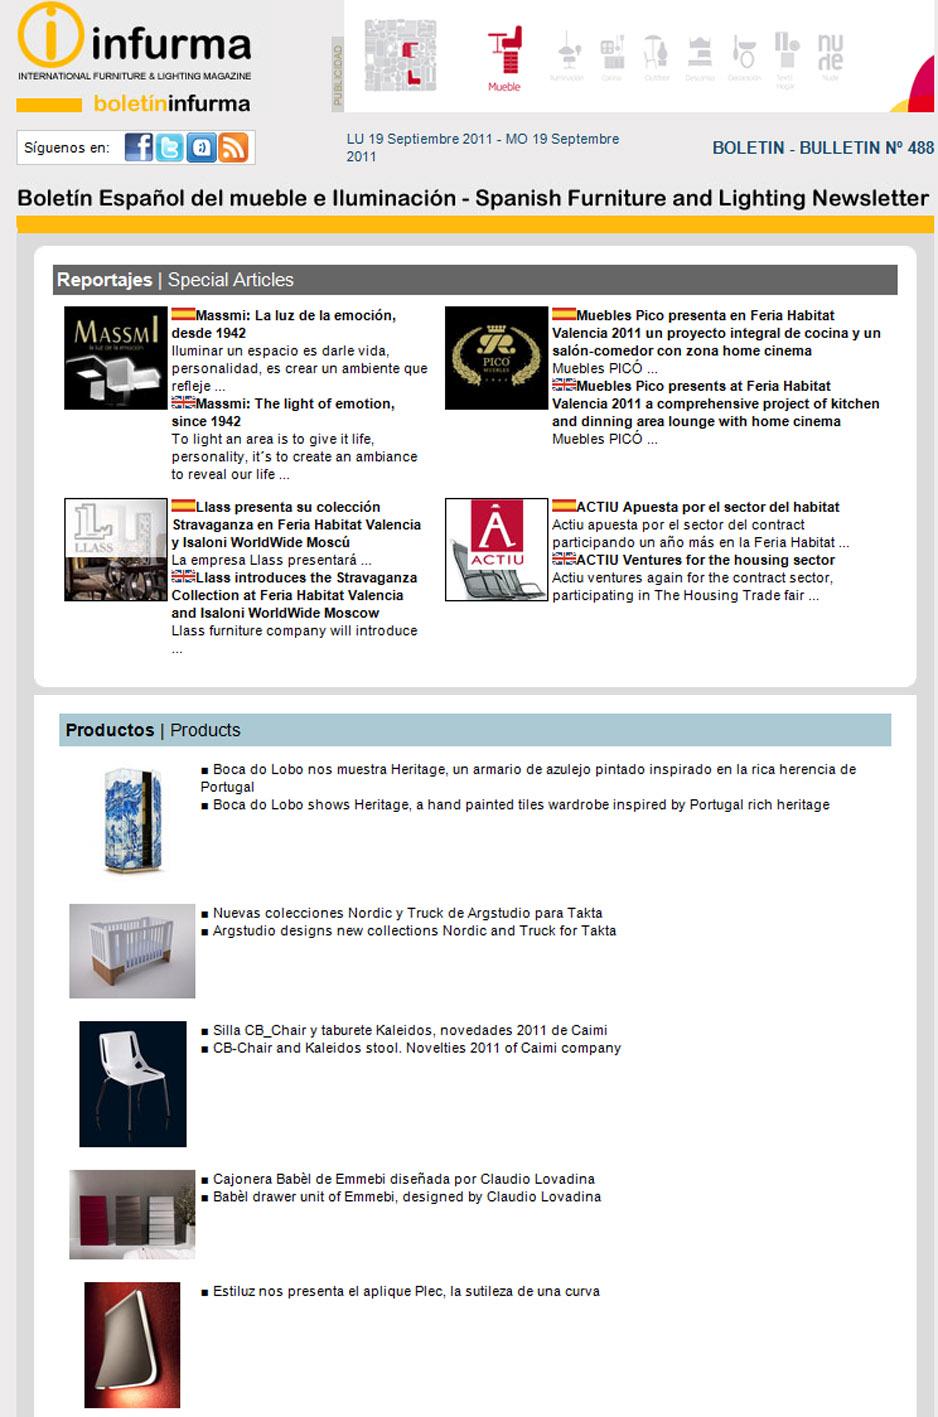 Infurma Newsletter 19 Settembre 11 Spagna.jpg